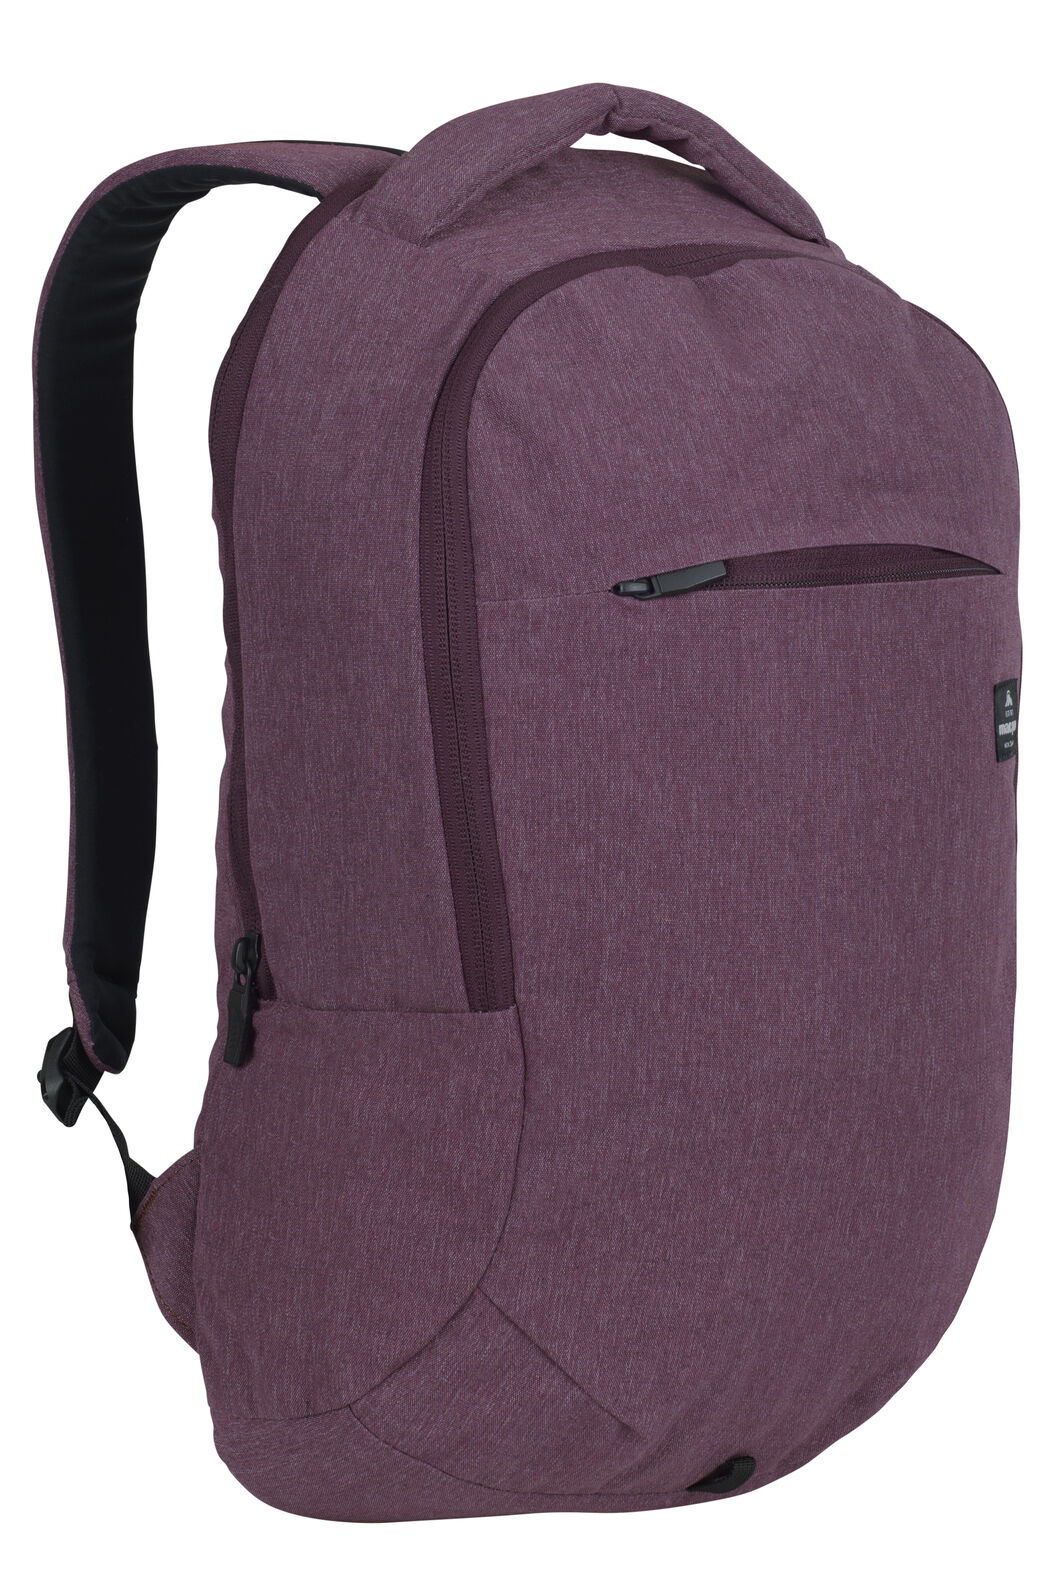 Macpac Slim 15L Backpack, Fig, hi-res